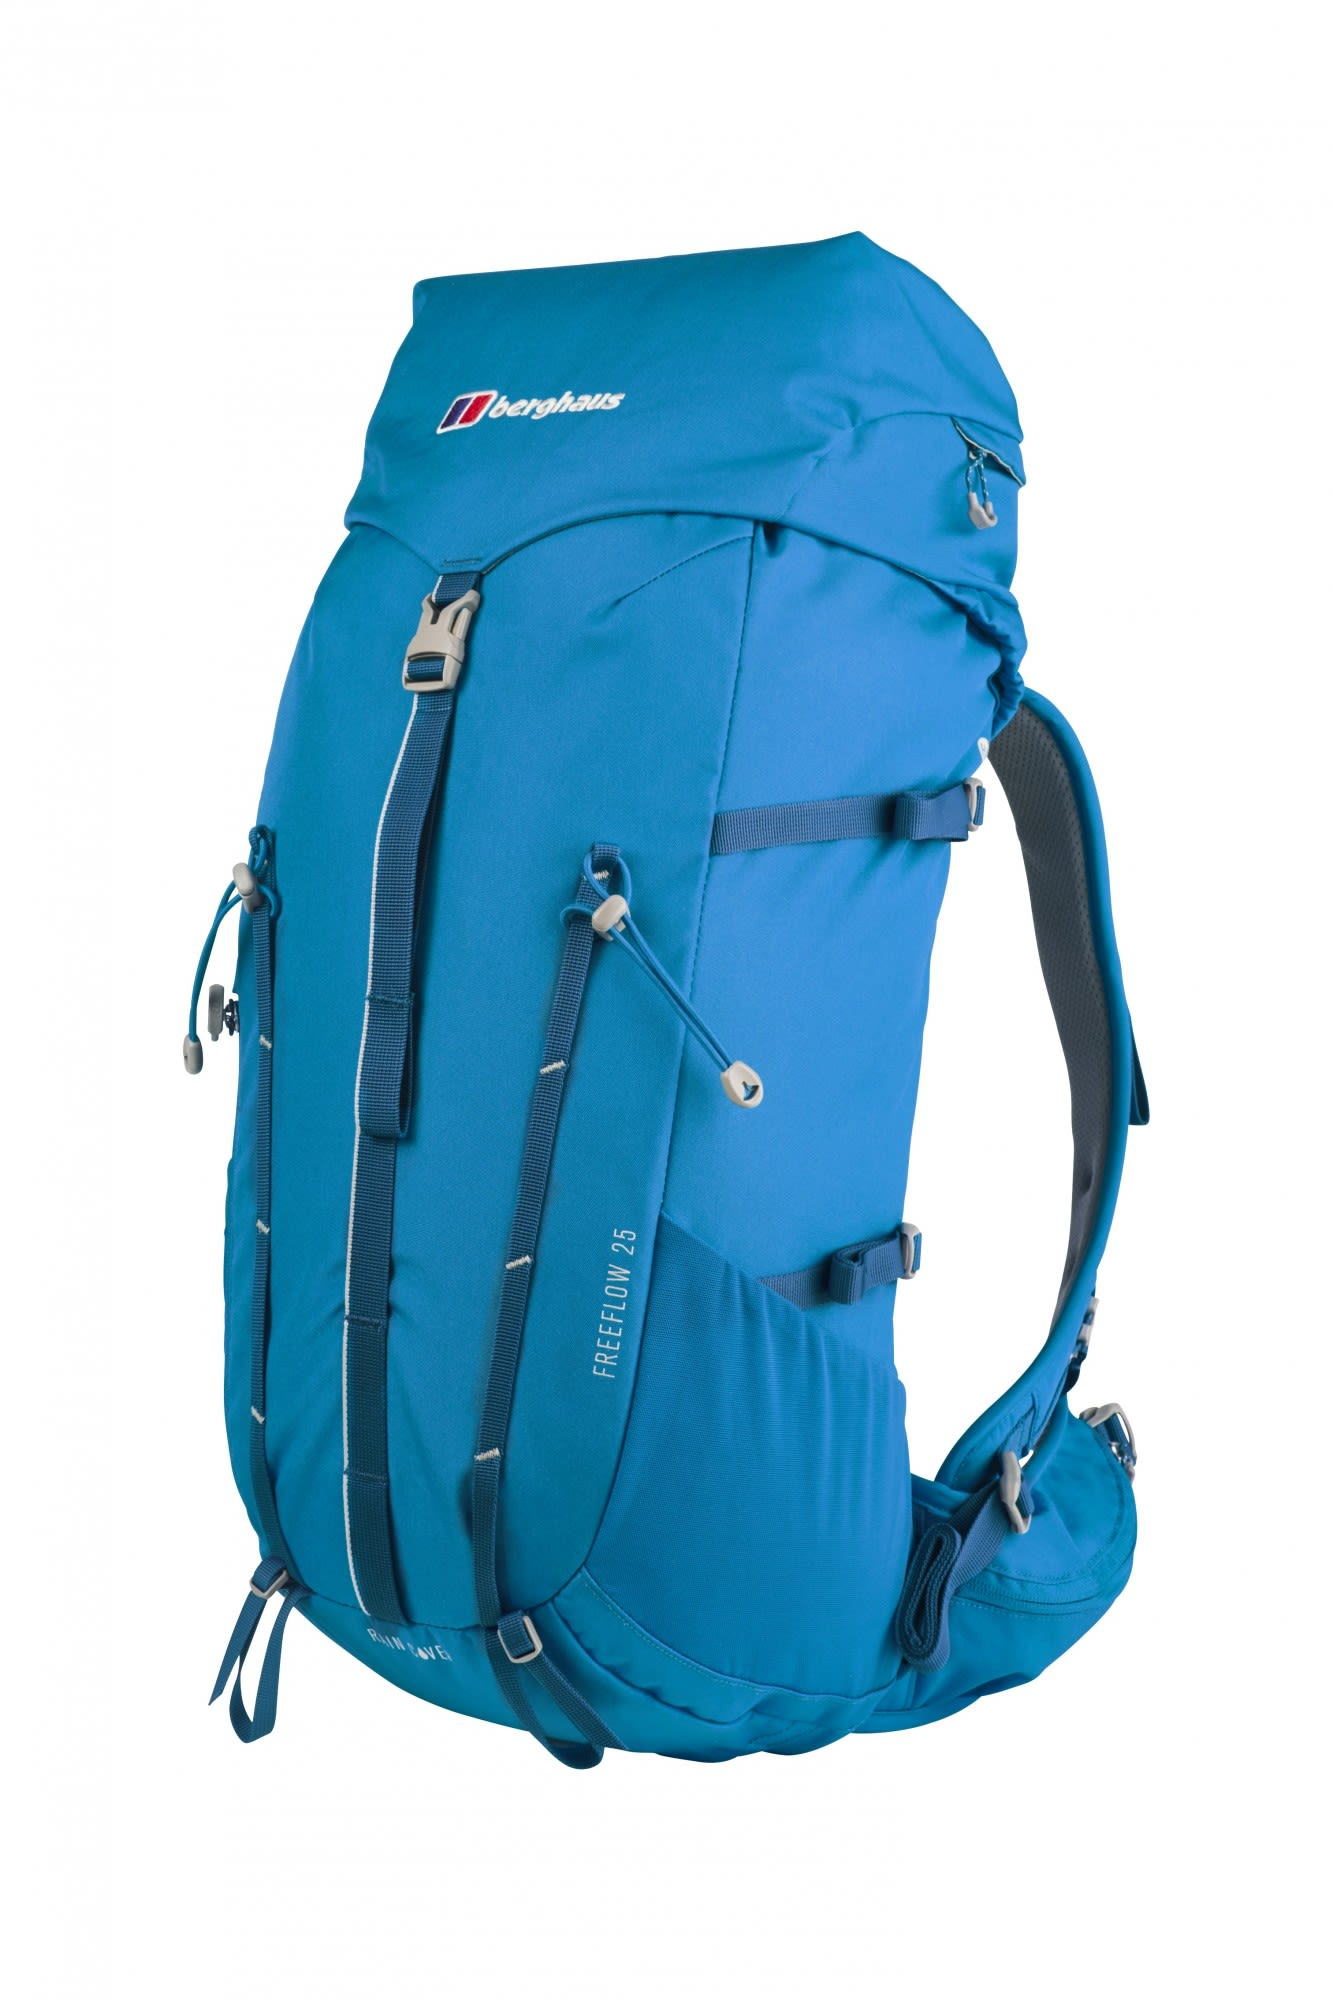 Berghaus Freeflow 25 Backpack | Größe 25l |  Alpin- & Trekkingrucksack